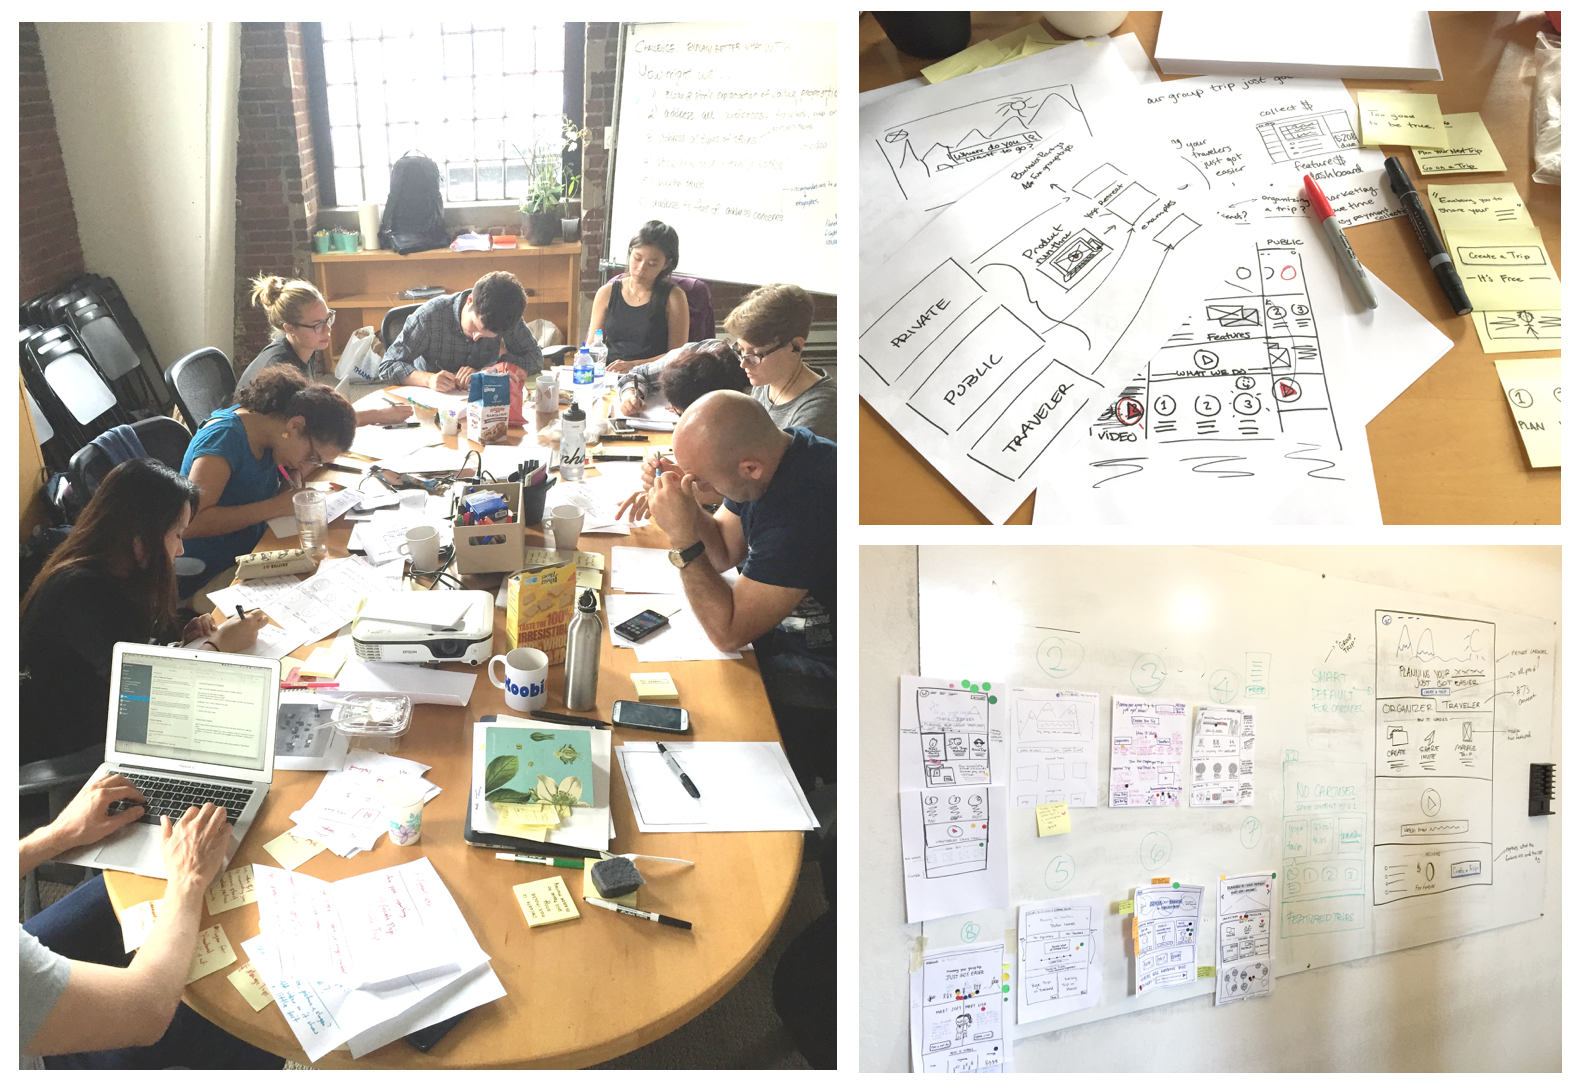 Scenes from our design studio